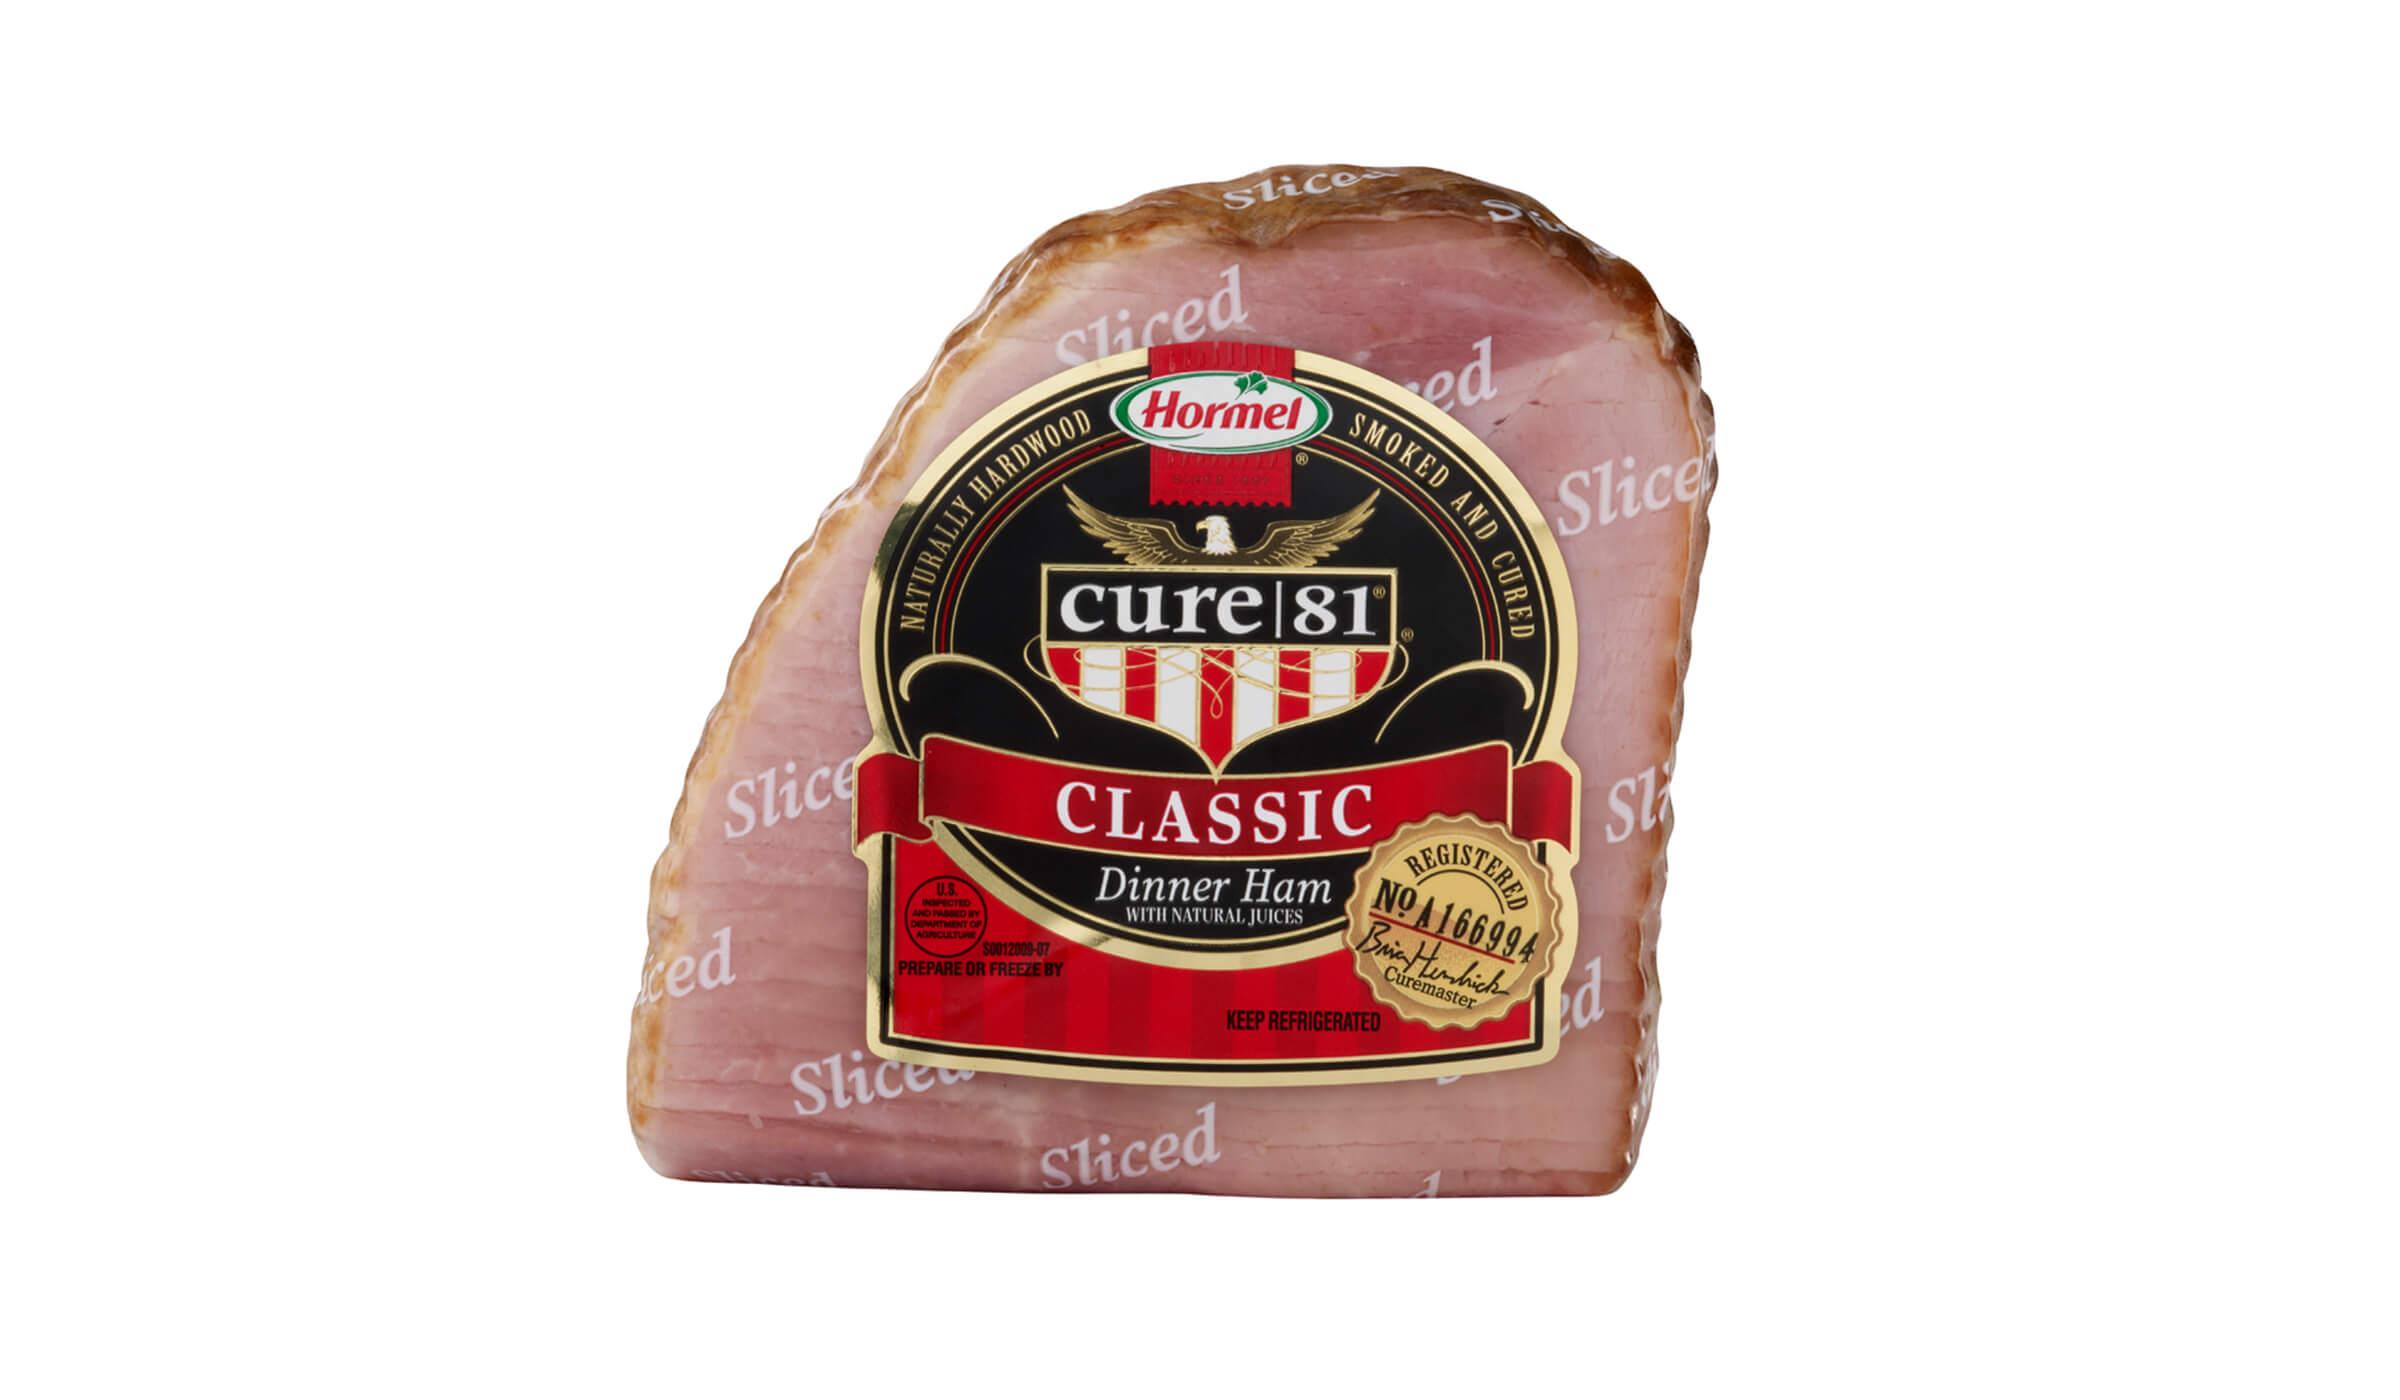 Cure 81 ham